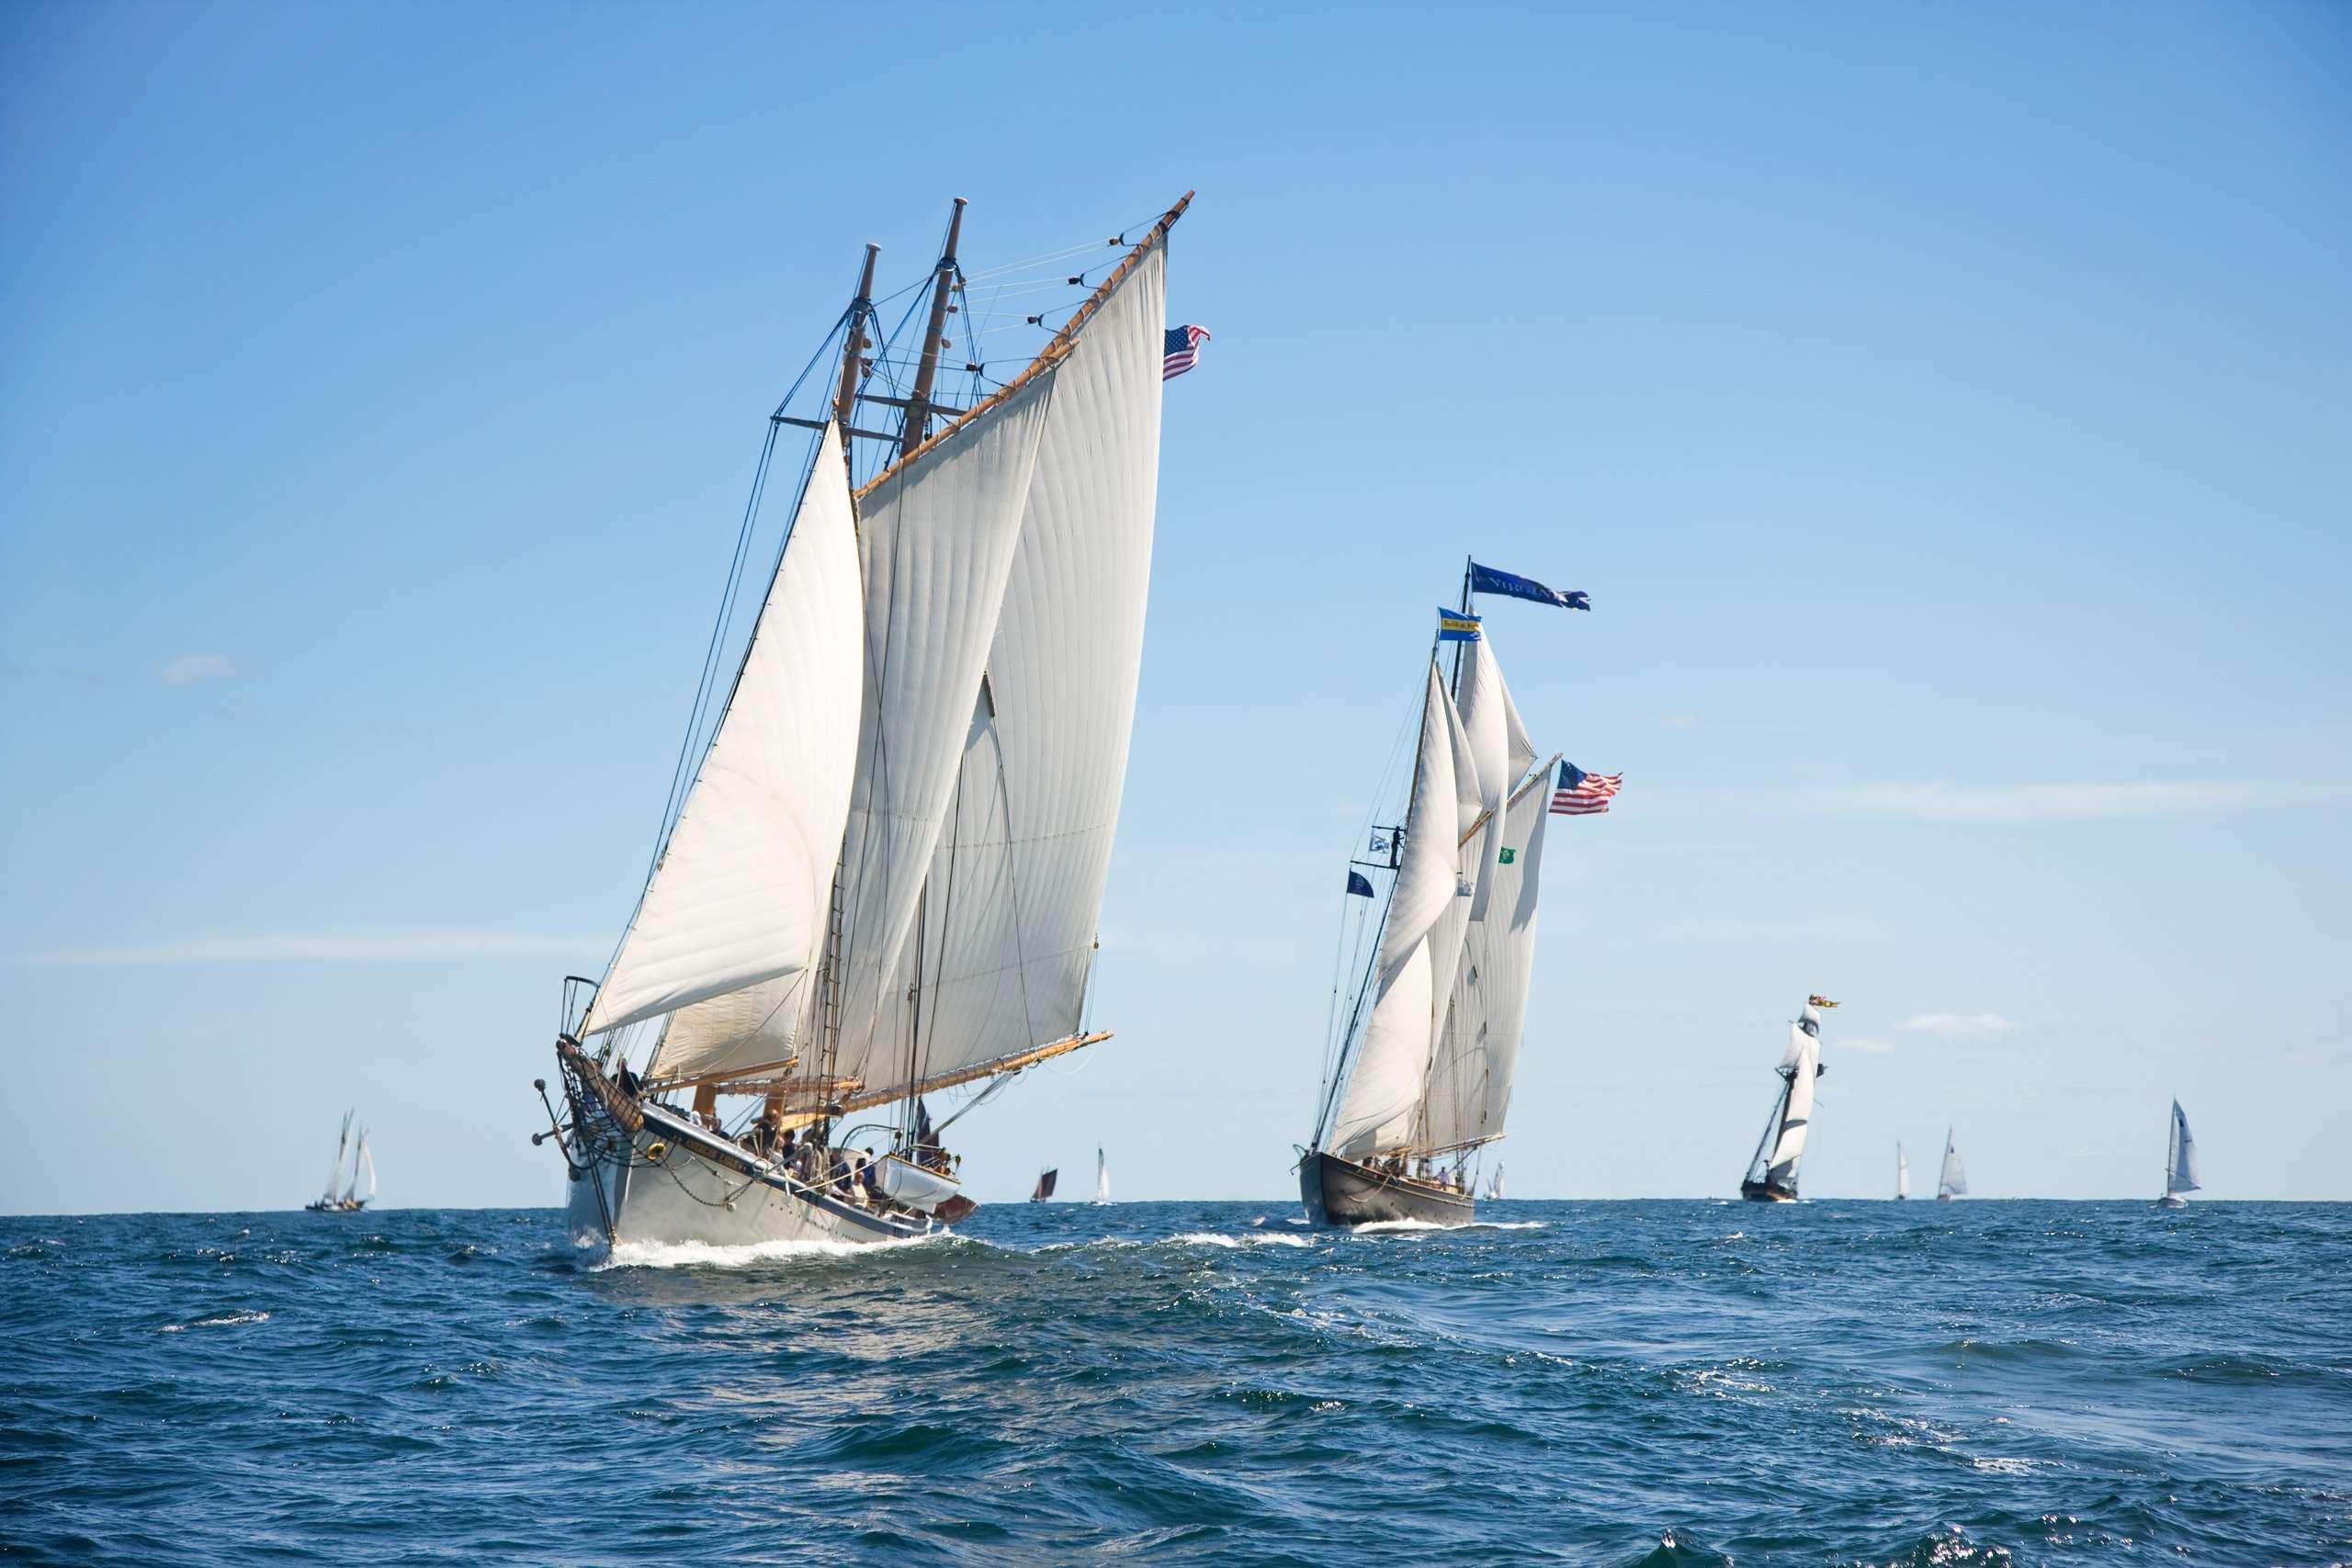 PORTFOLIO - Sailing - Windjammers #16   PCG453